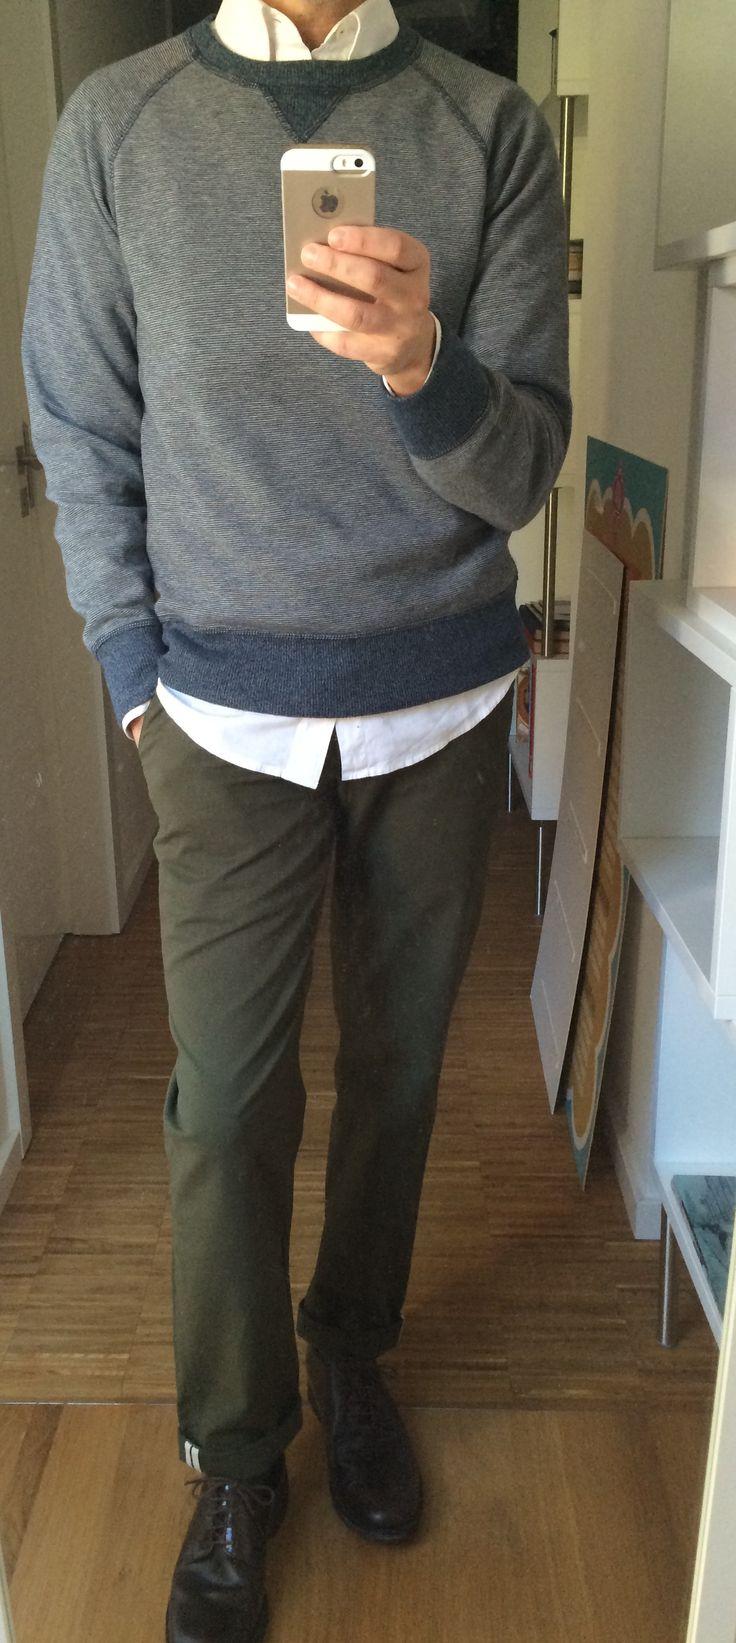 Ben Sherman Shirt, Chinos and Shoes. Billy Reid Sweatshirt.